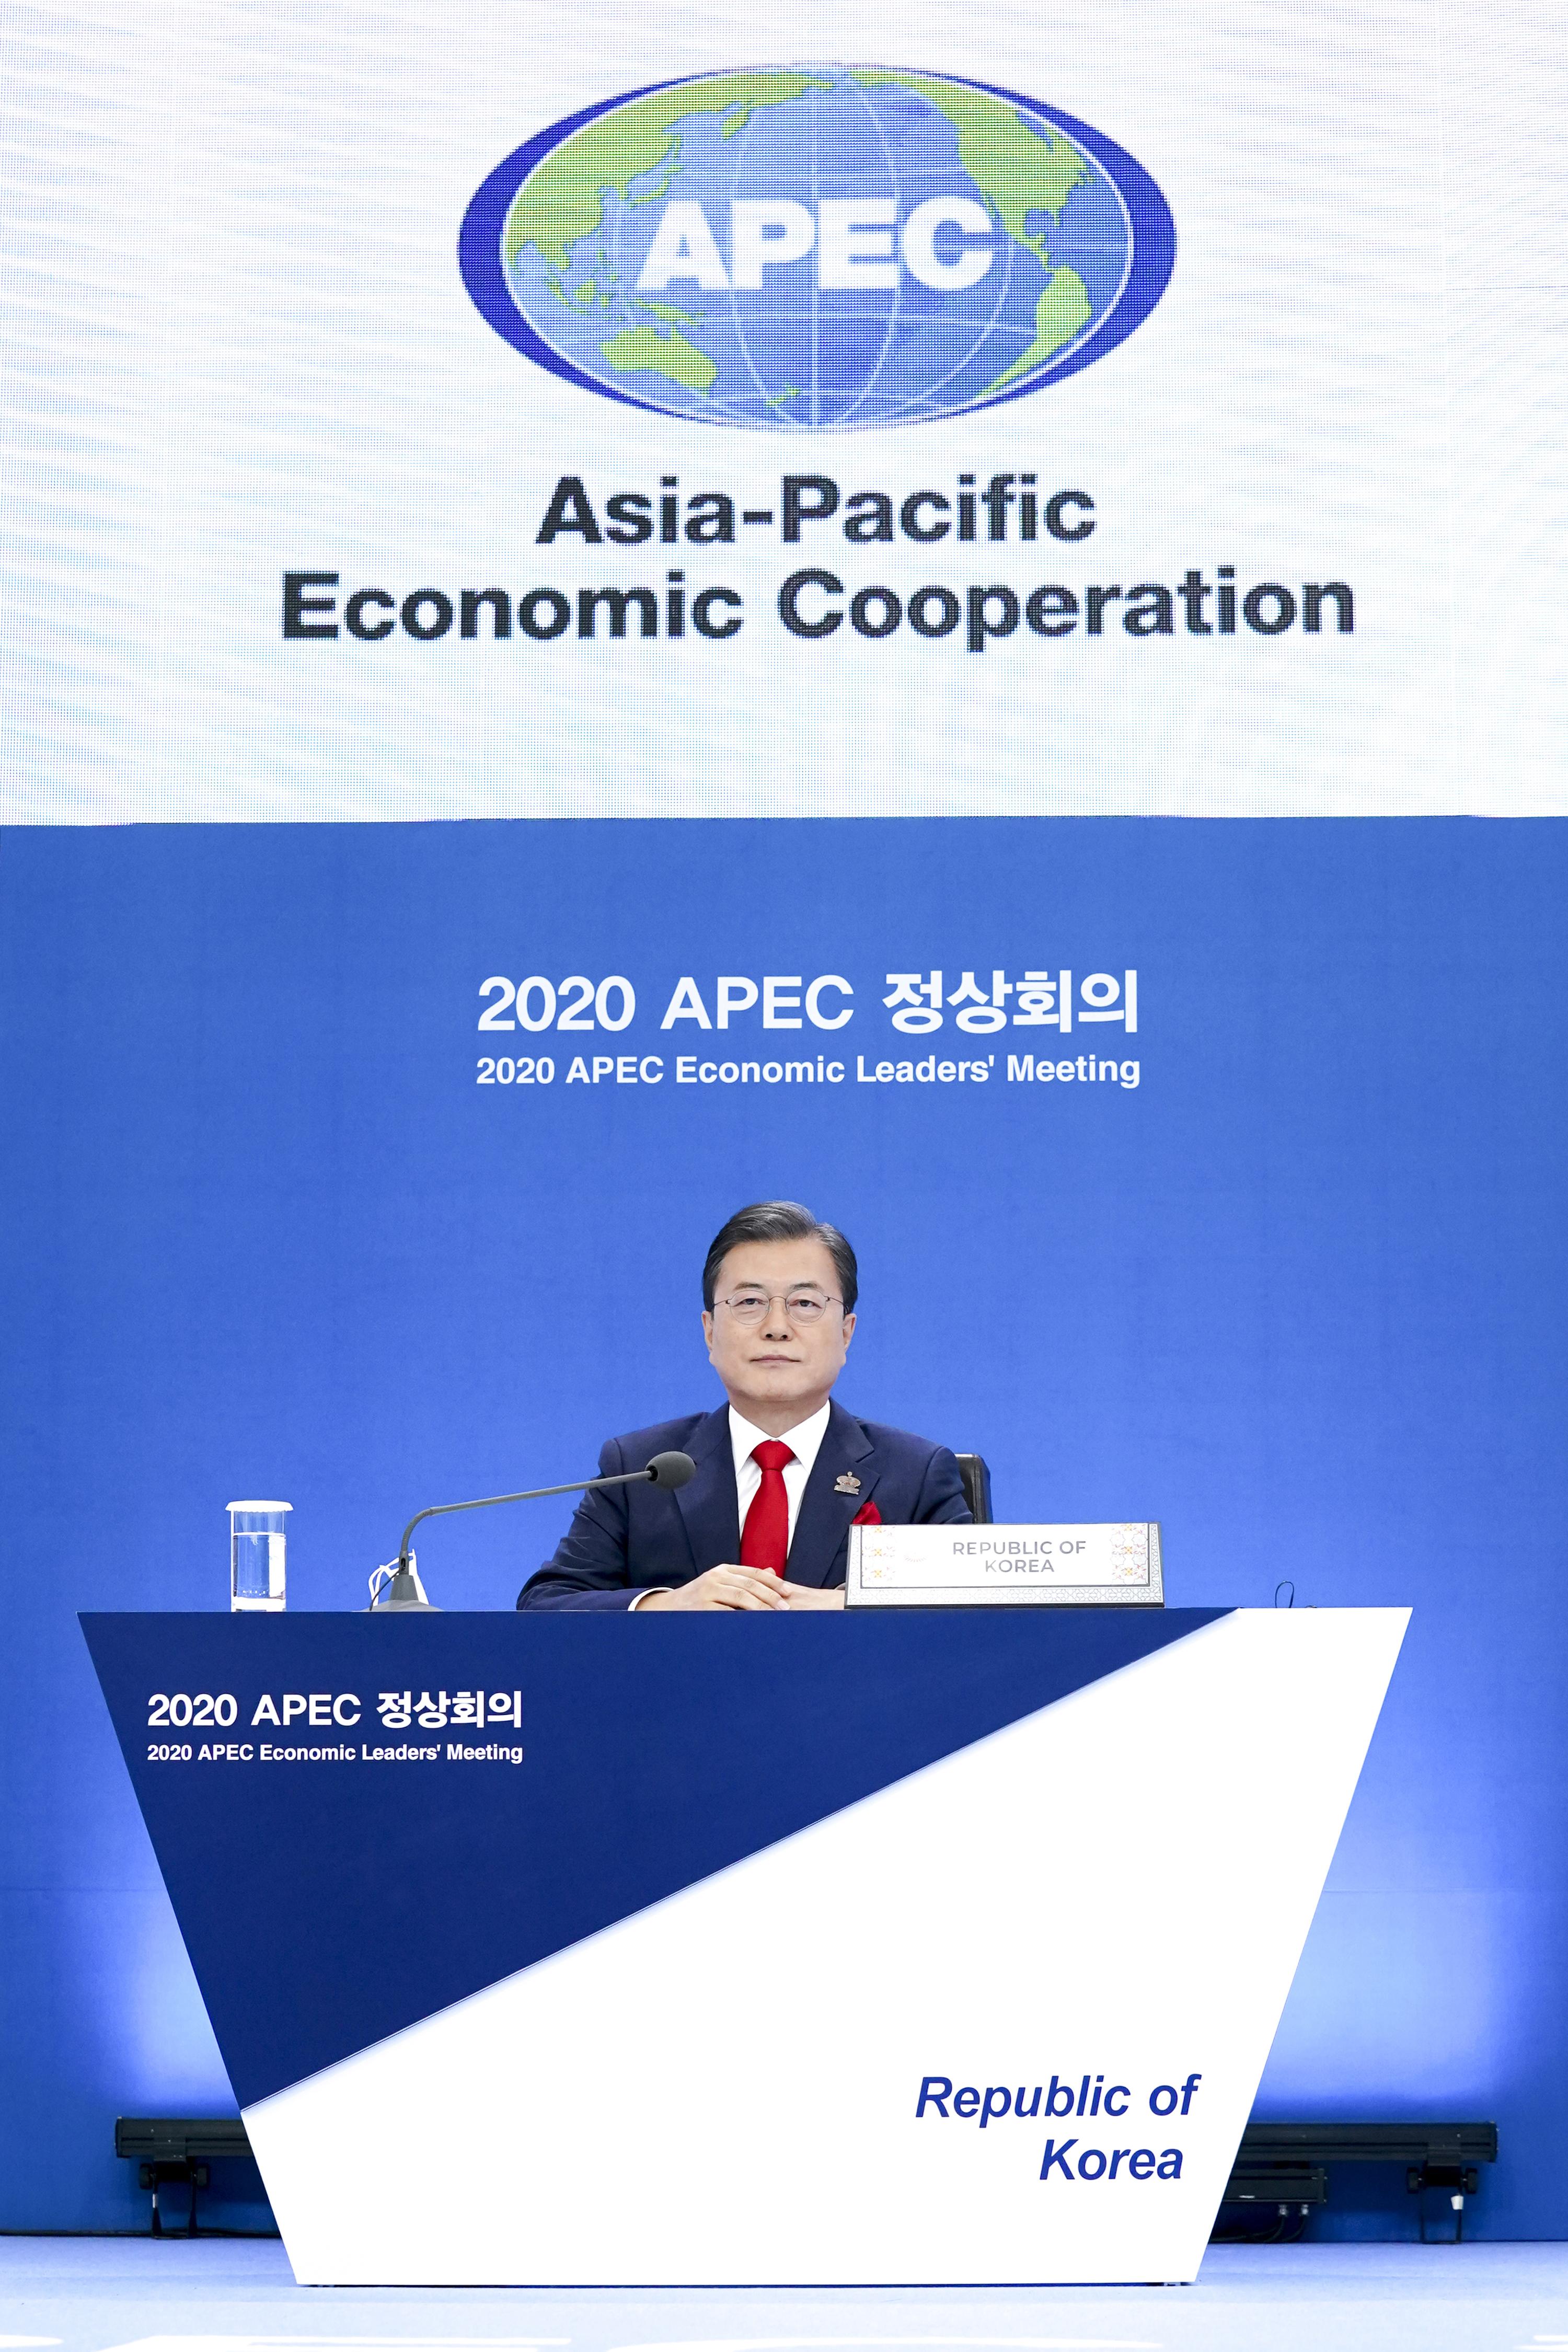 APEC 정상회의 참석한 문재인 대통령